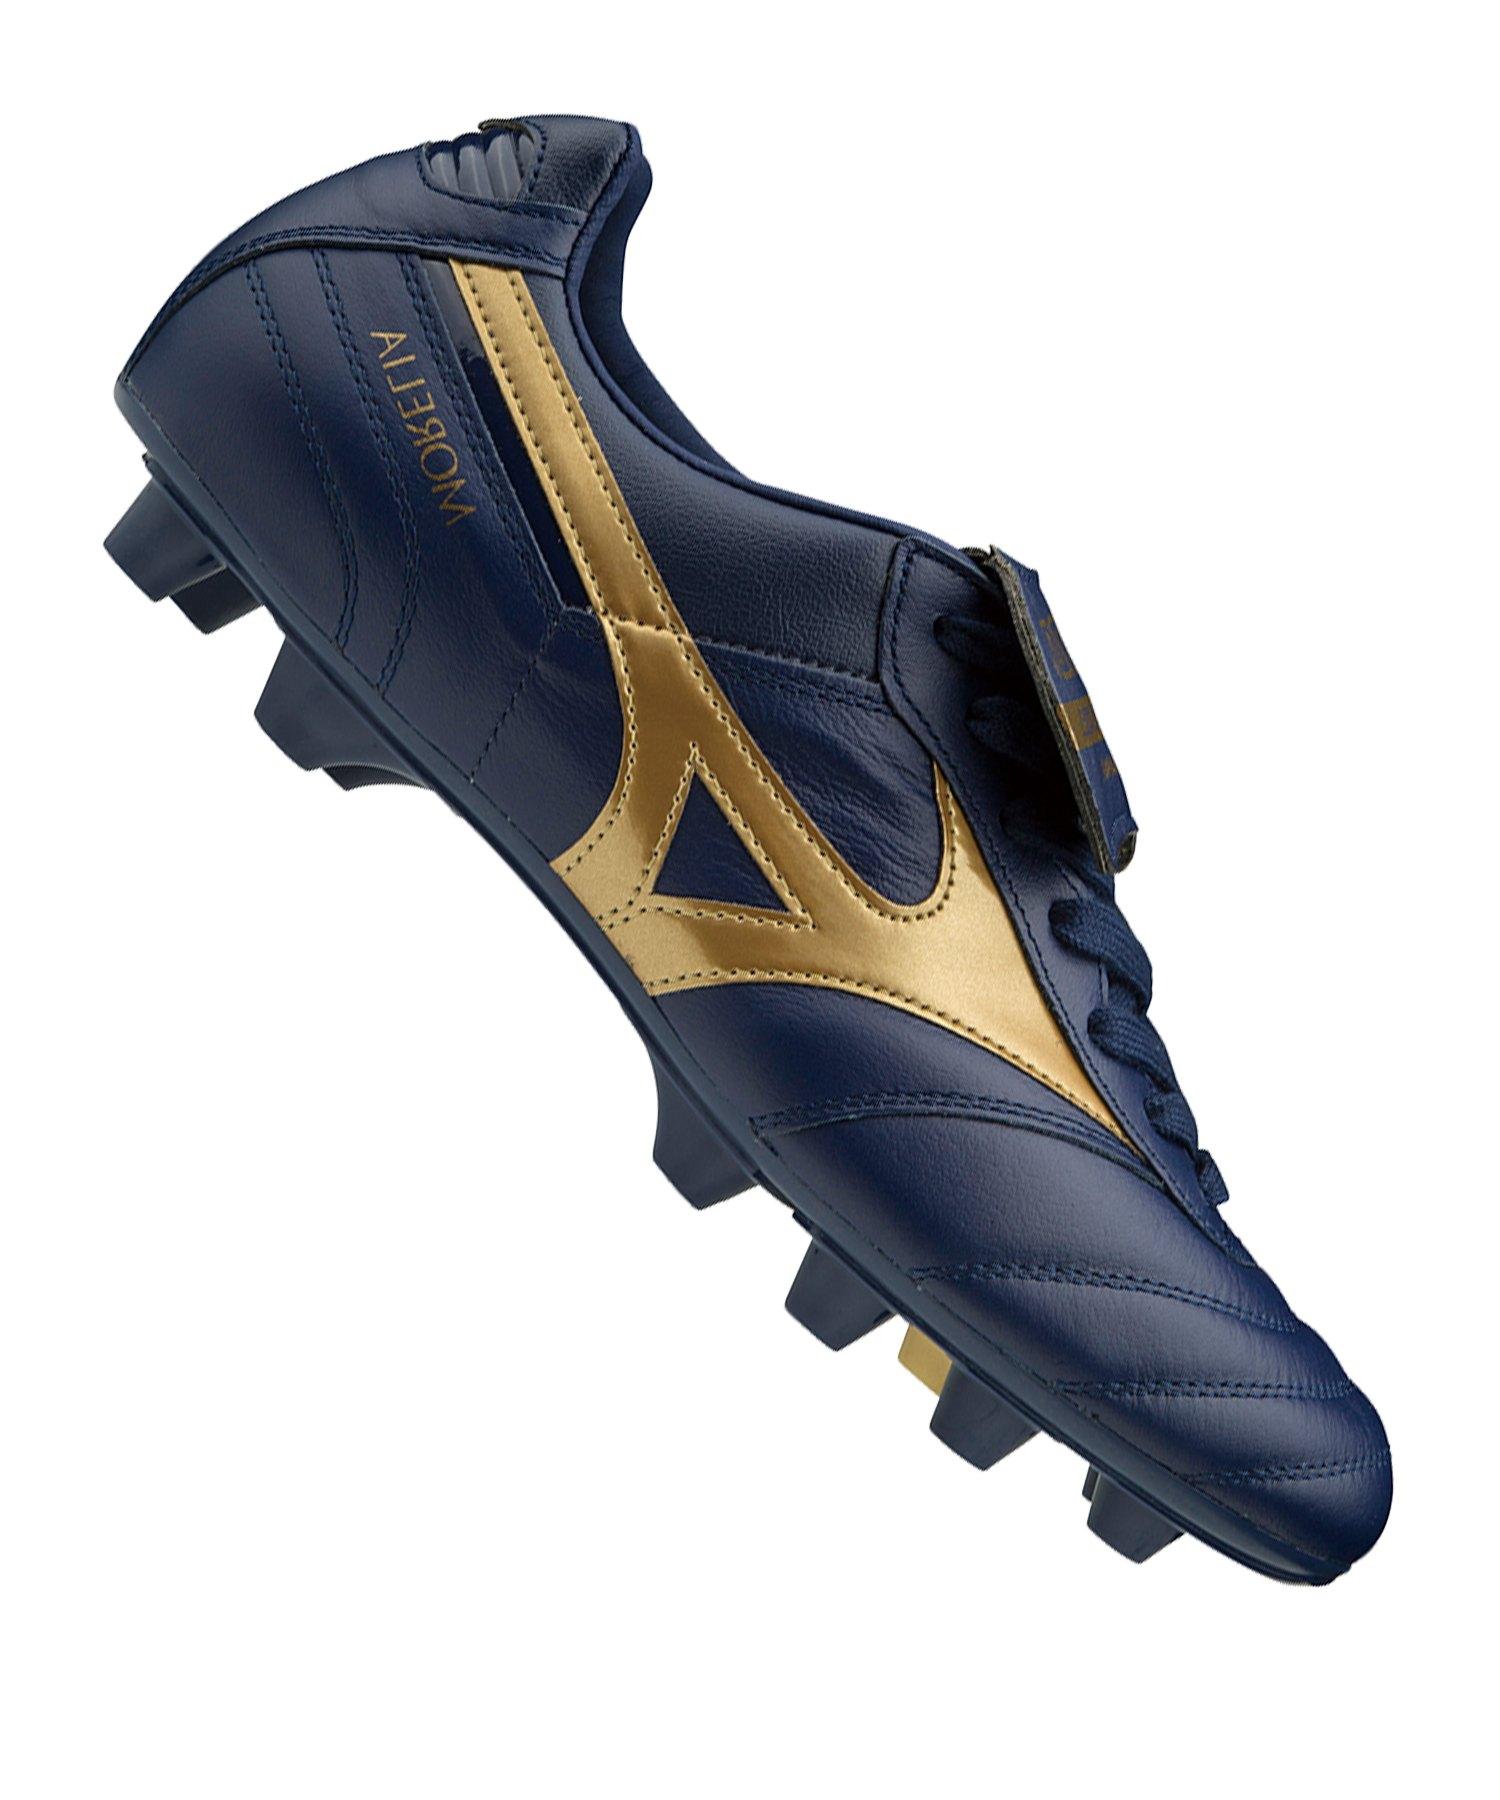 Mizuno Morelia II Japan FG Blau Gold F50 - blau